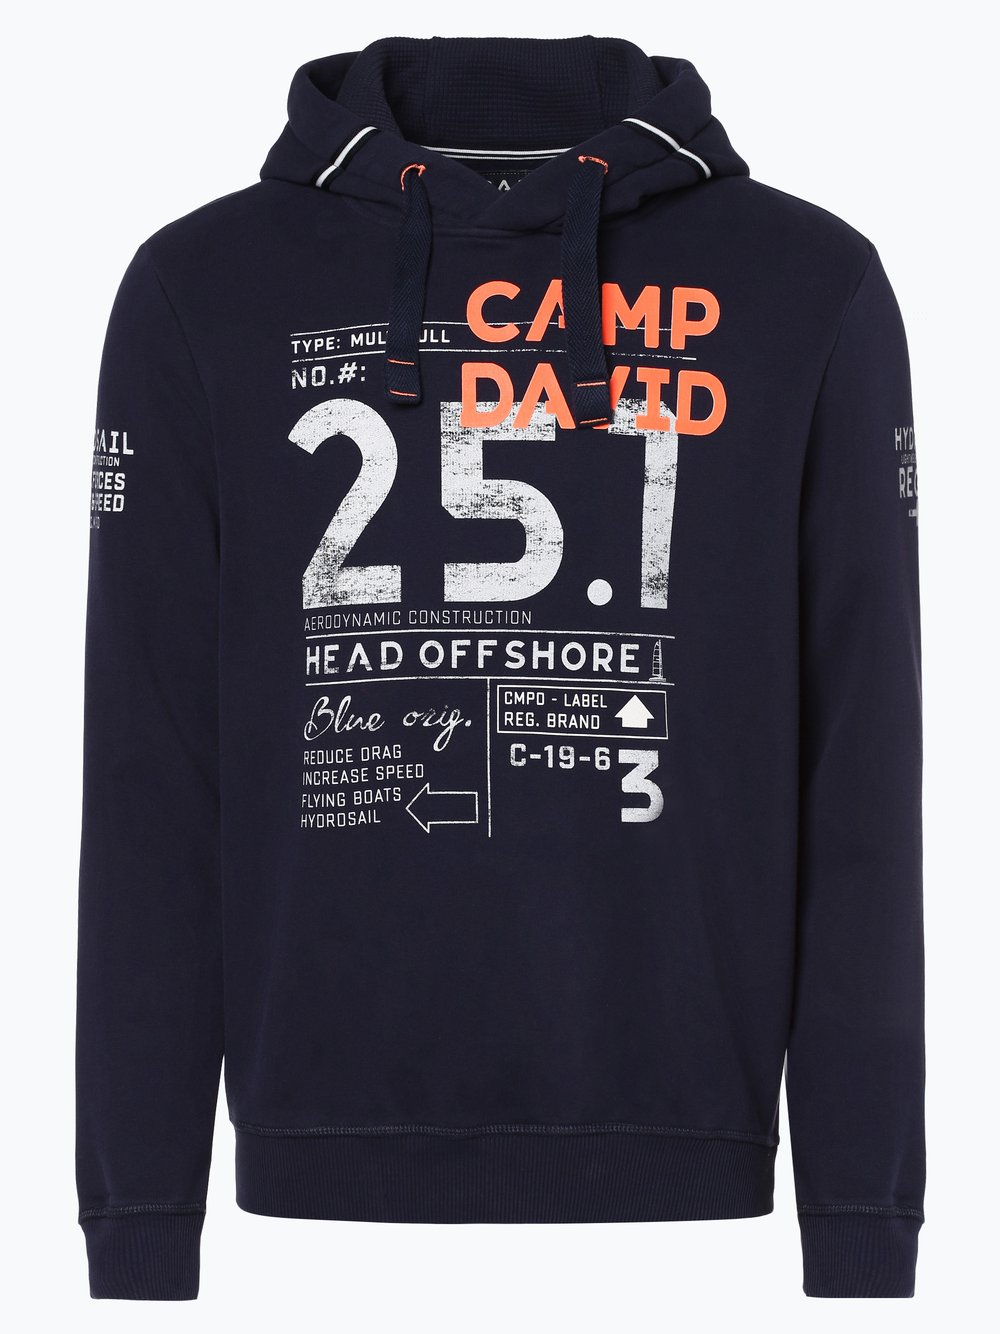 neue Season beste Seite USA billig verkaufen Camp David Herren Sweatshirt online kaufen   VANGRAAF.COM